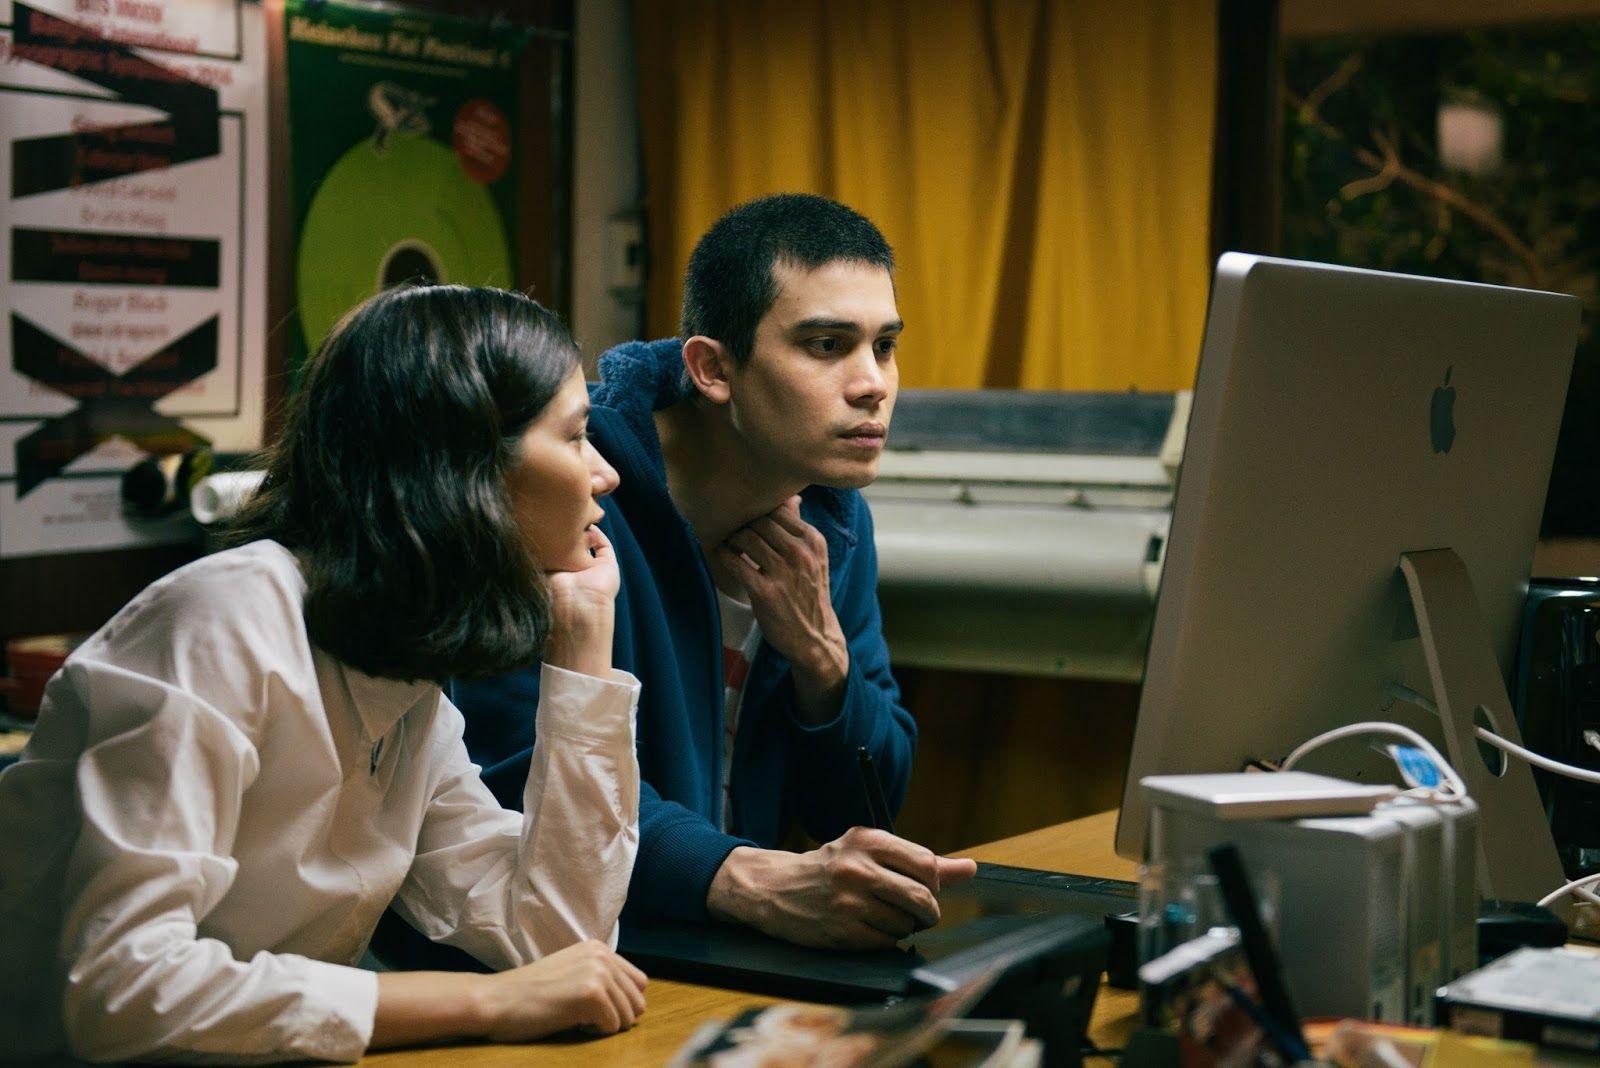 SMR Culture Plus: The 15th New York Asian Film Festival